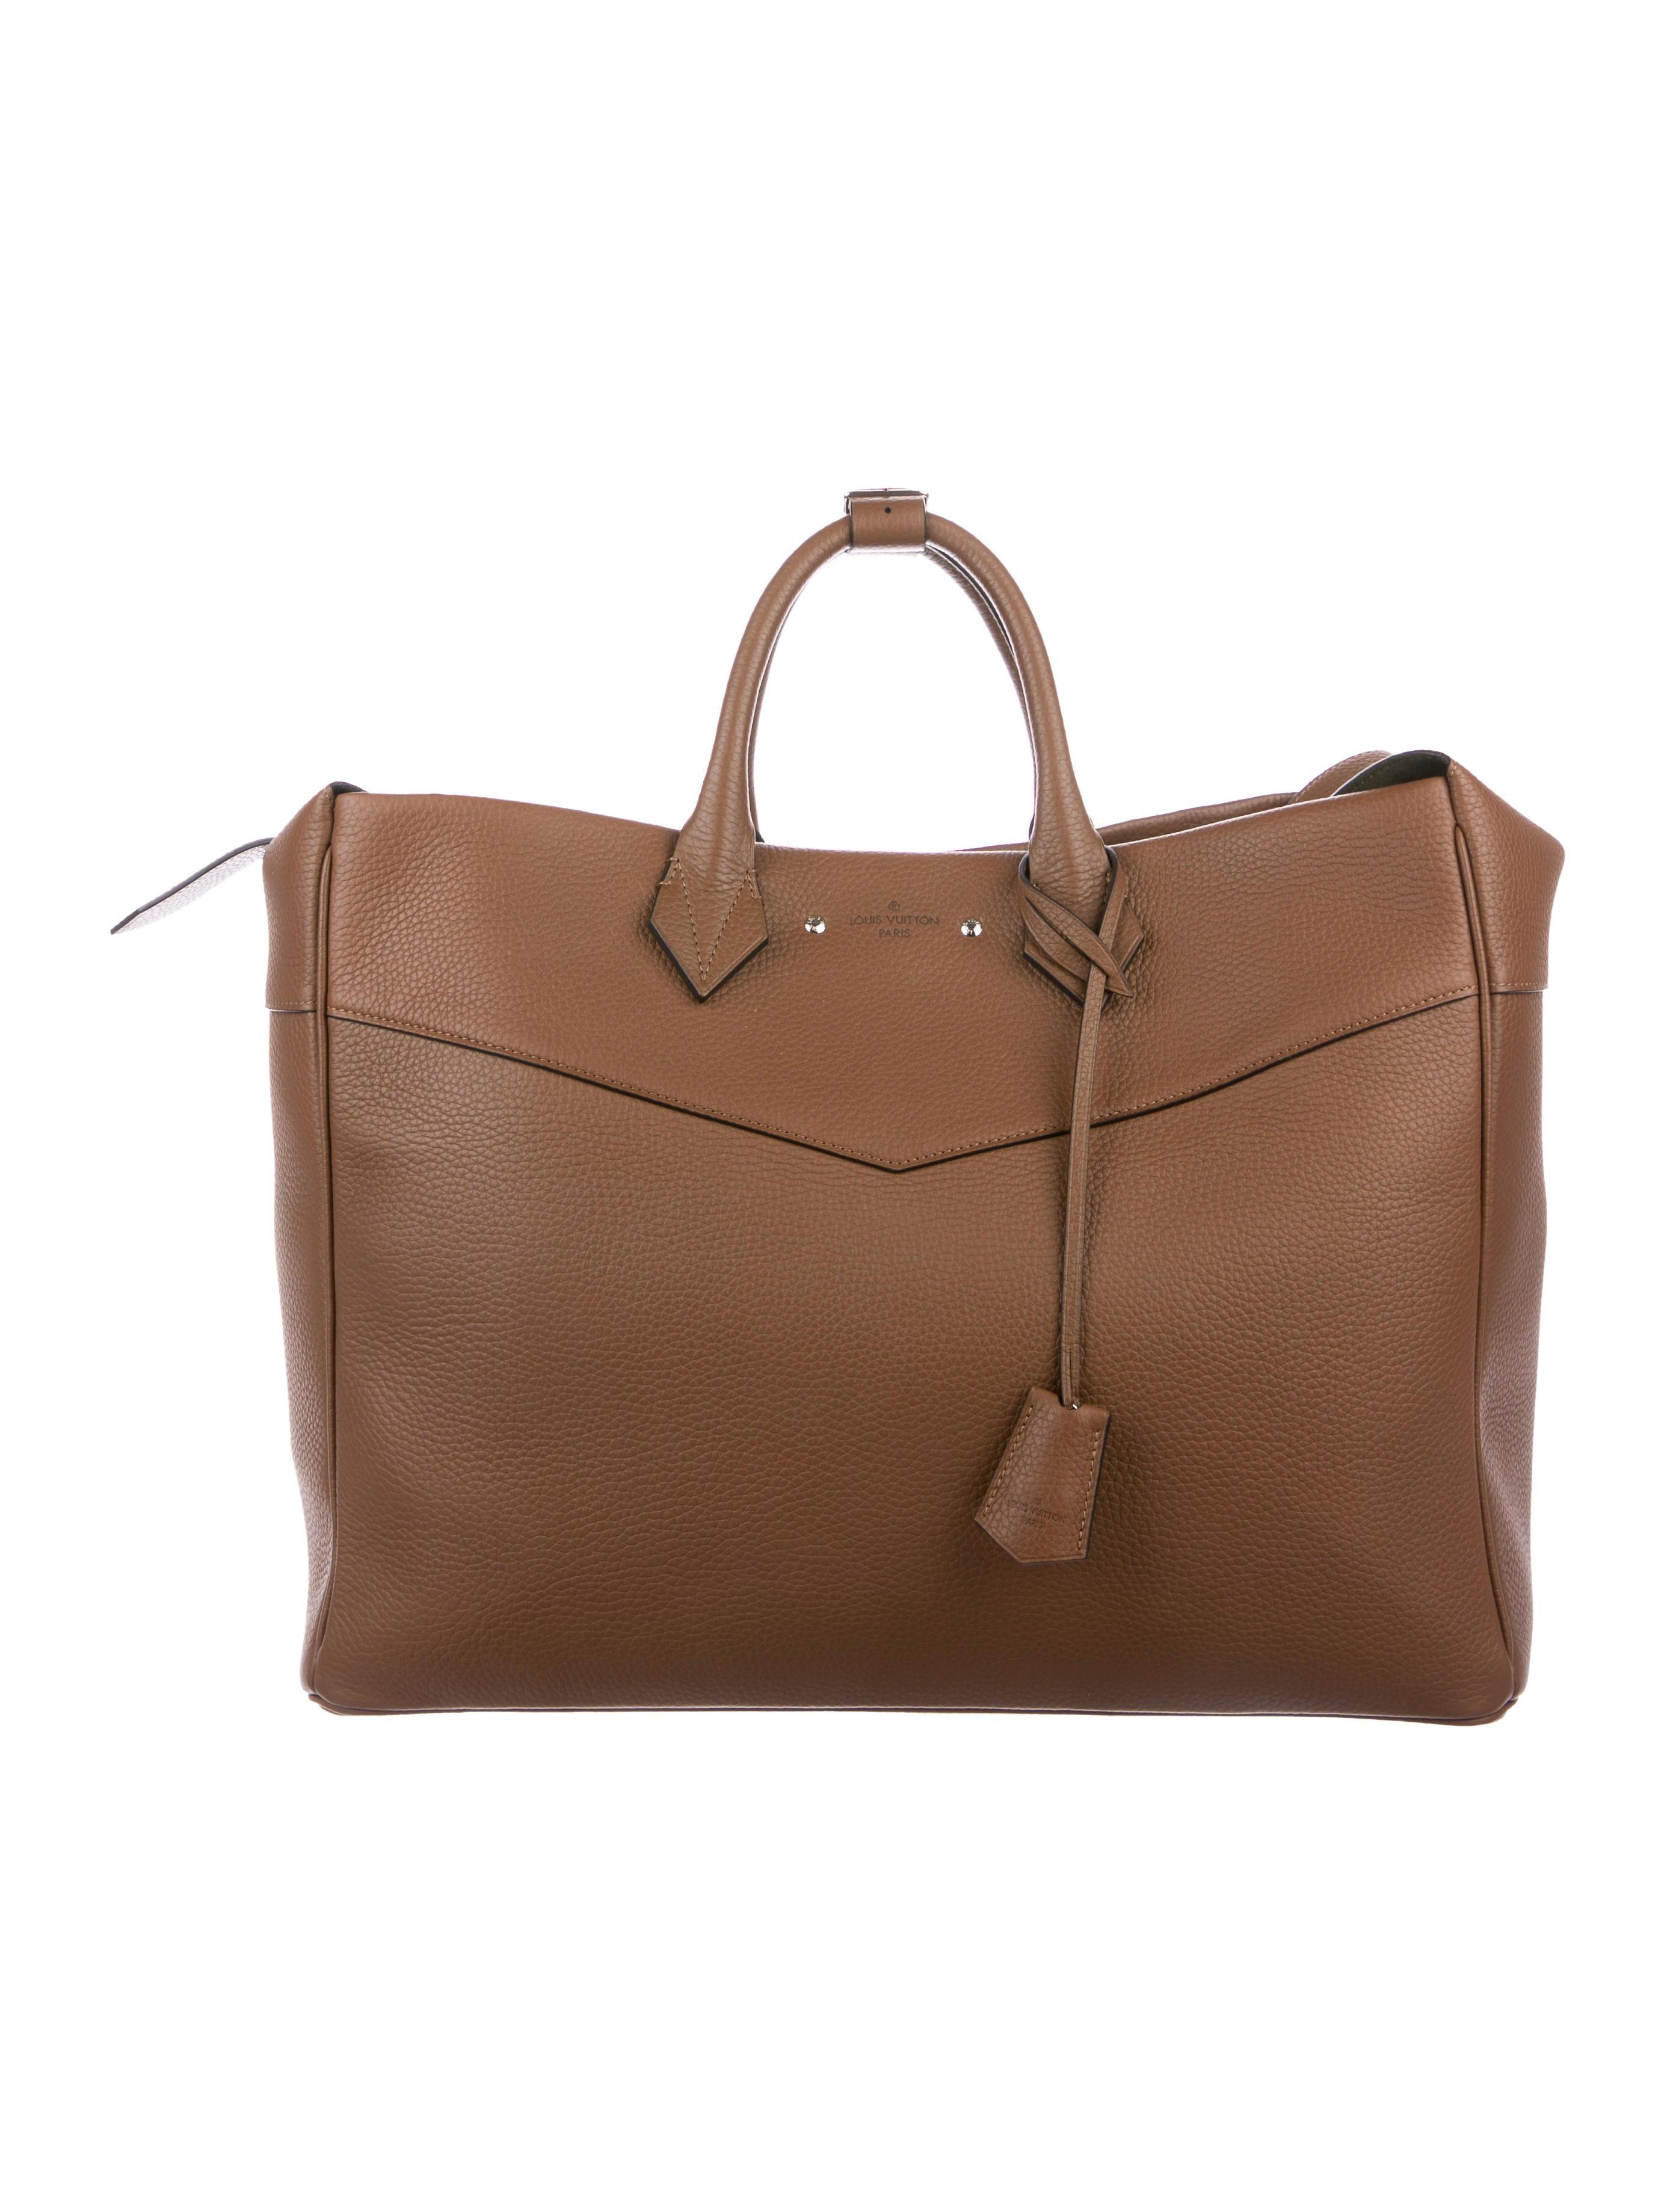 65c827617905 Louis Vuitton Taurillon Armand Open Tote - Bags - LOU200003